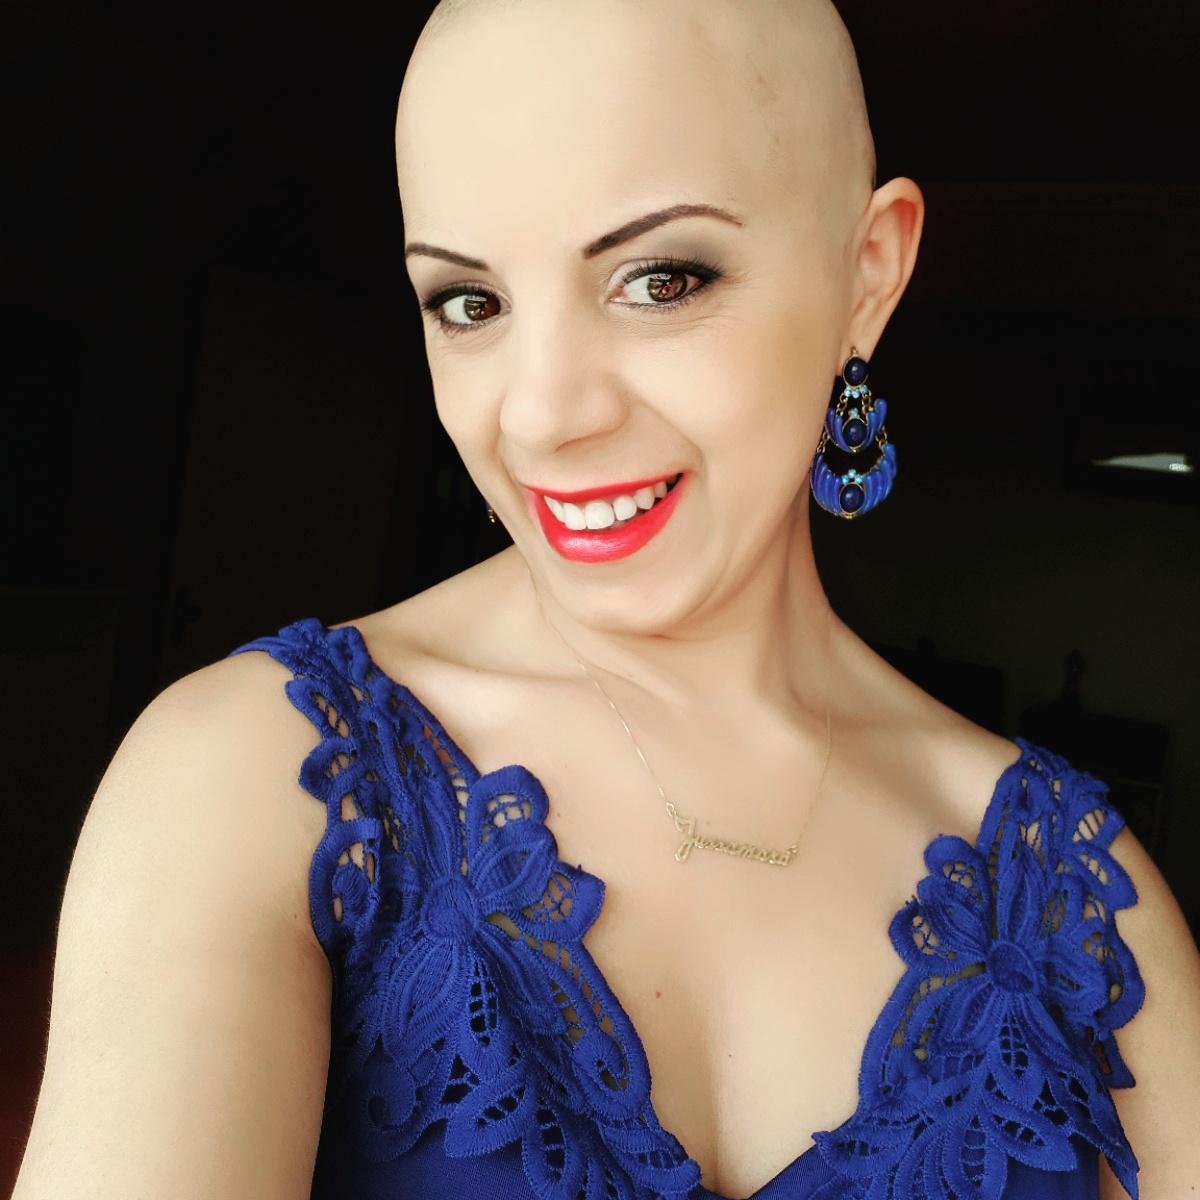 Jussamara Lorena Dias